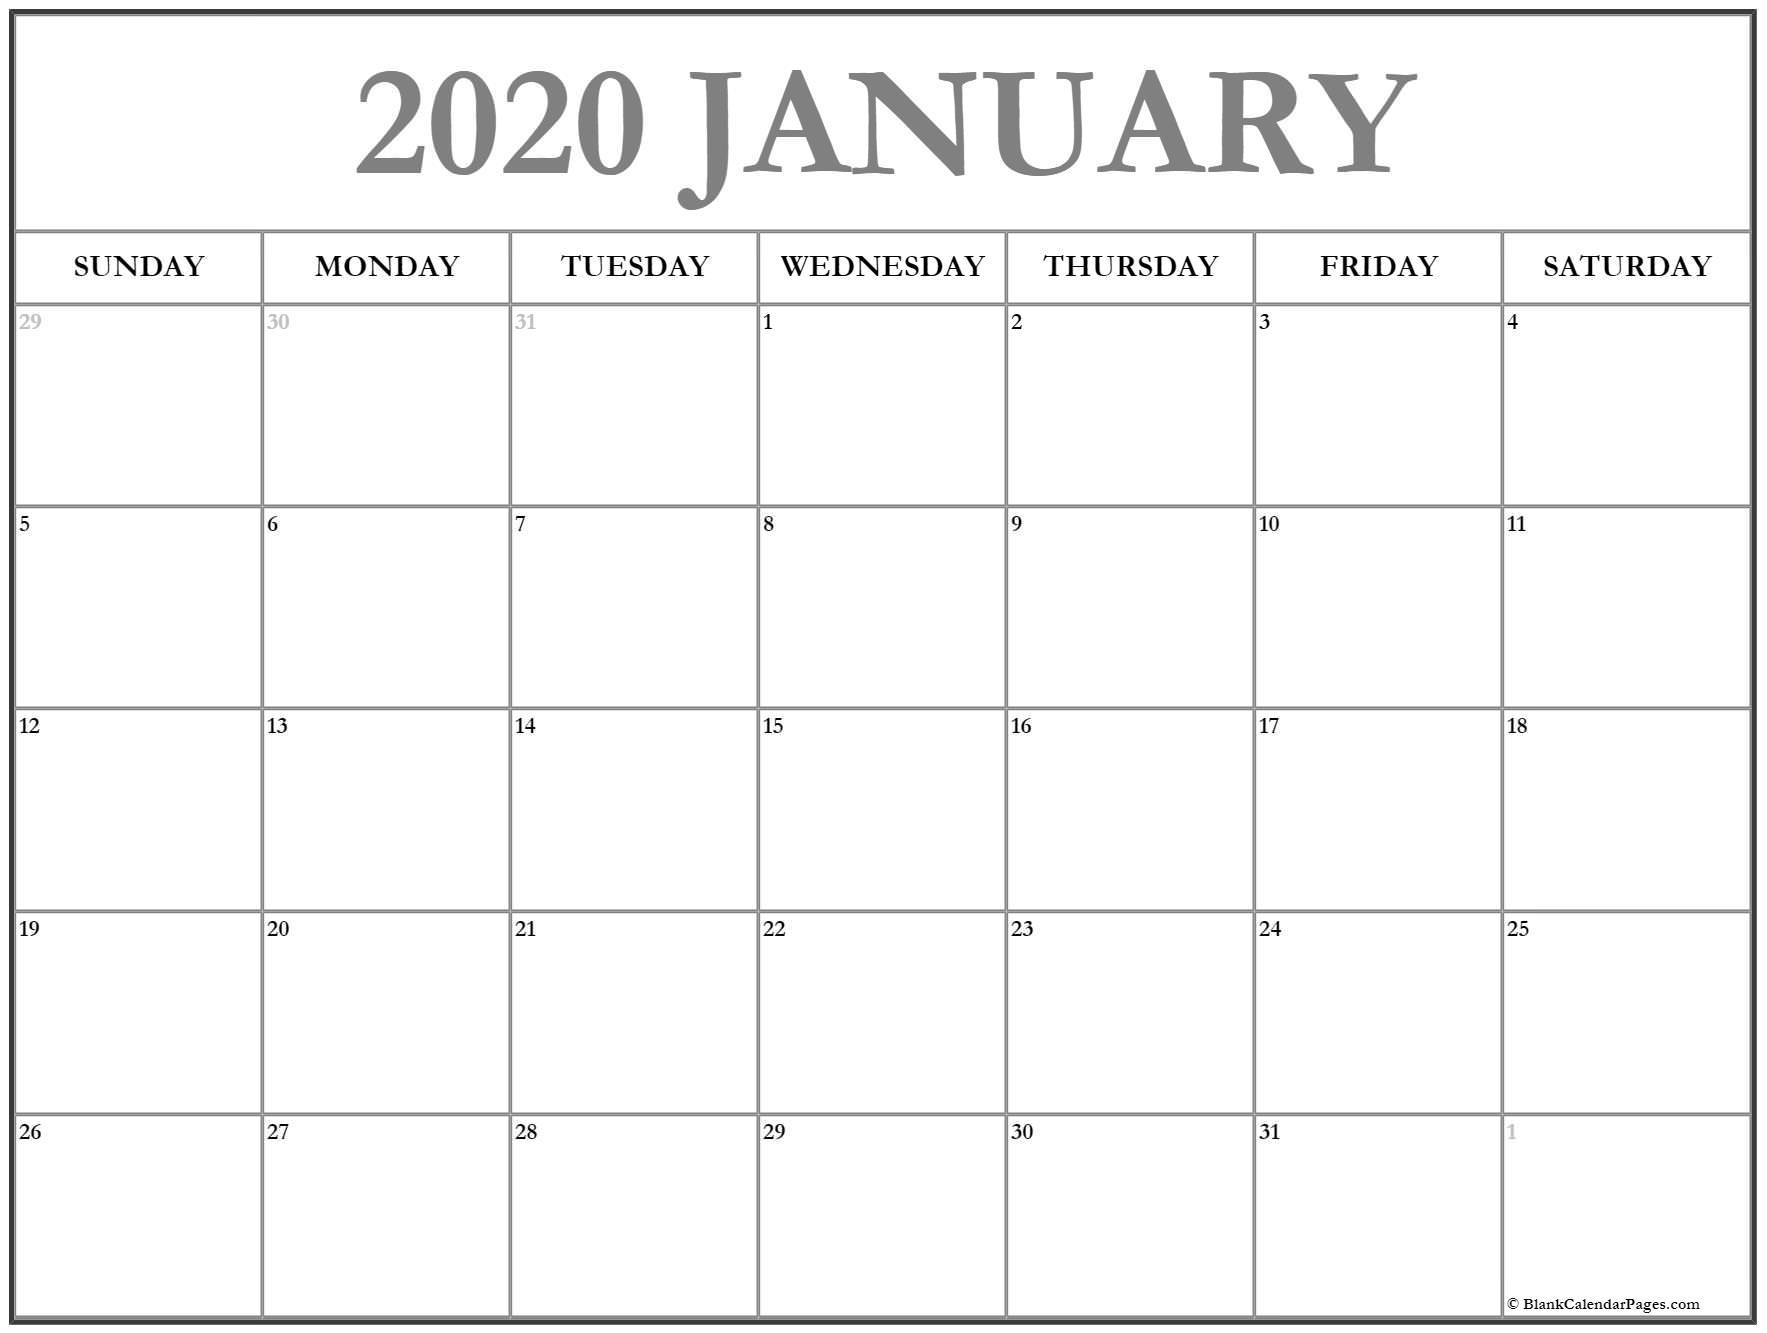 January 2020 Calendar | Free Printable Monthly Calendars intended for Free Printable 2020 Calendar With Space To Write